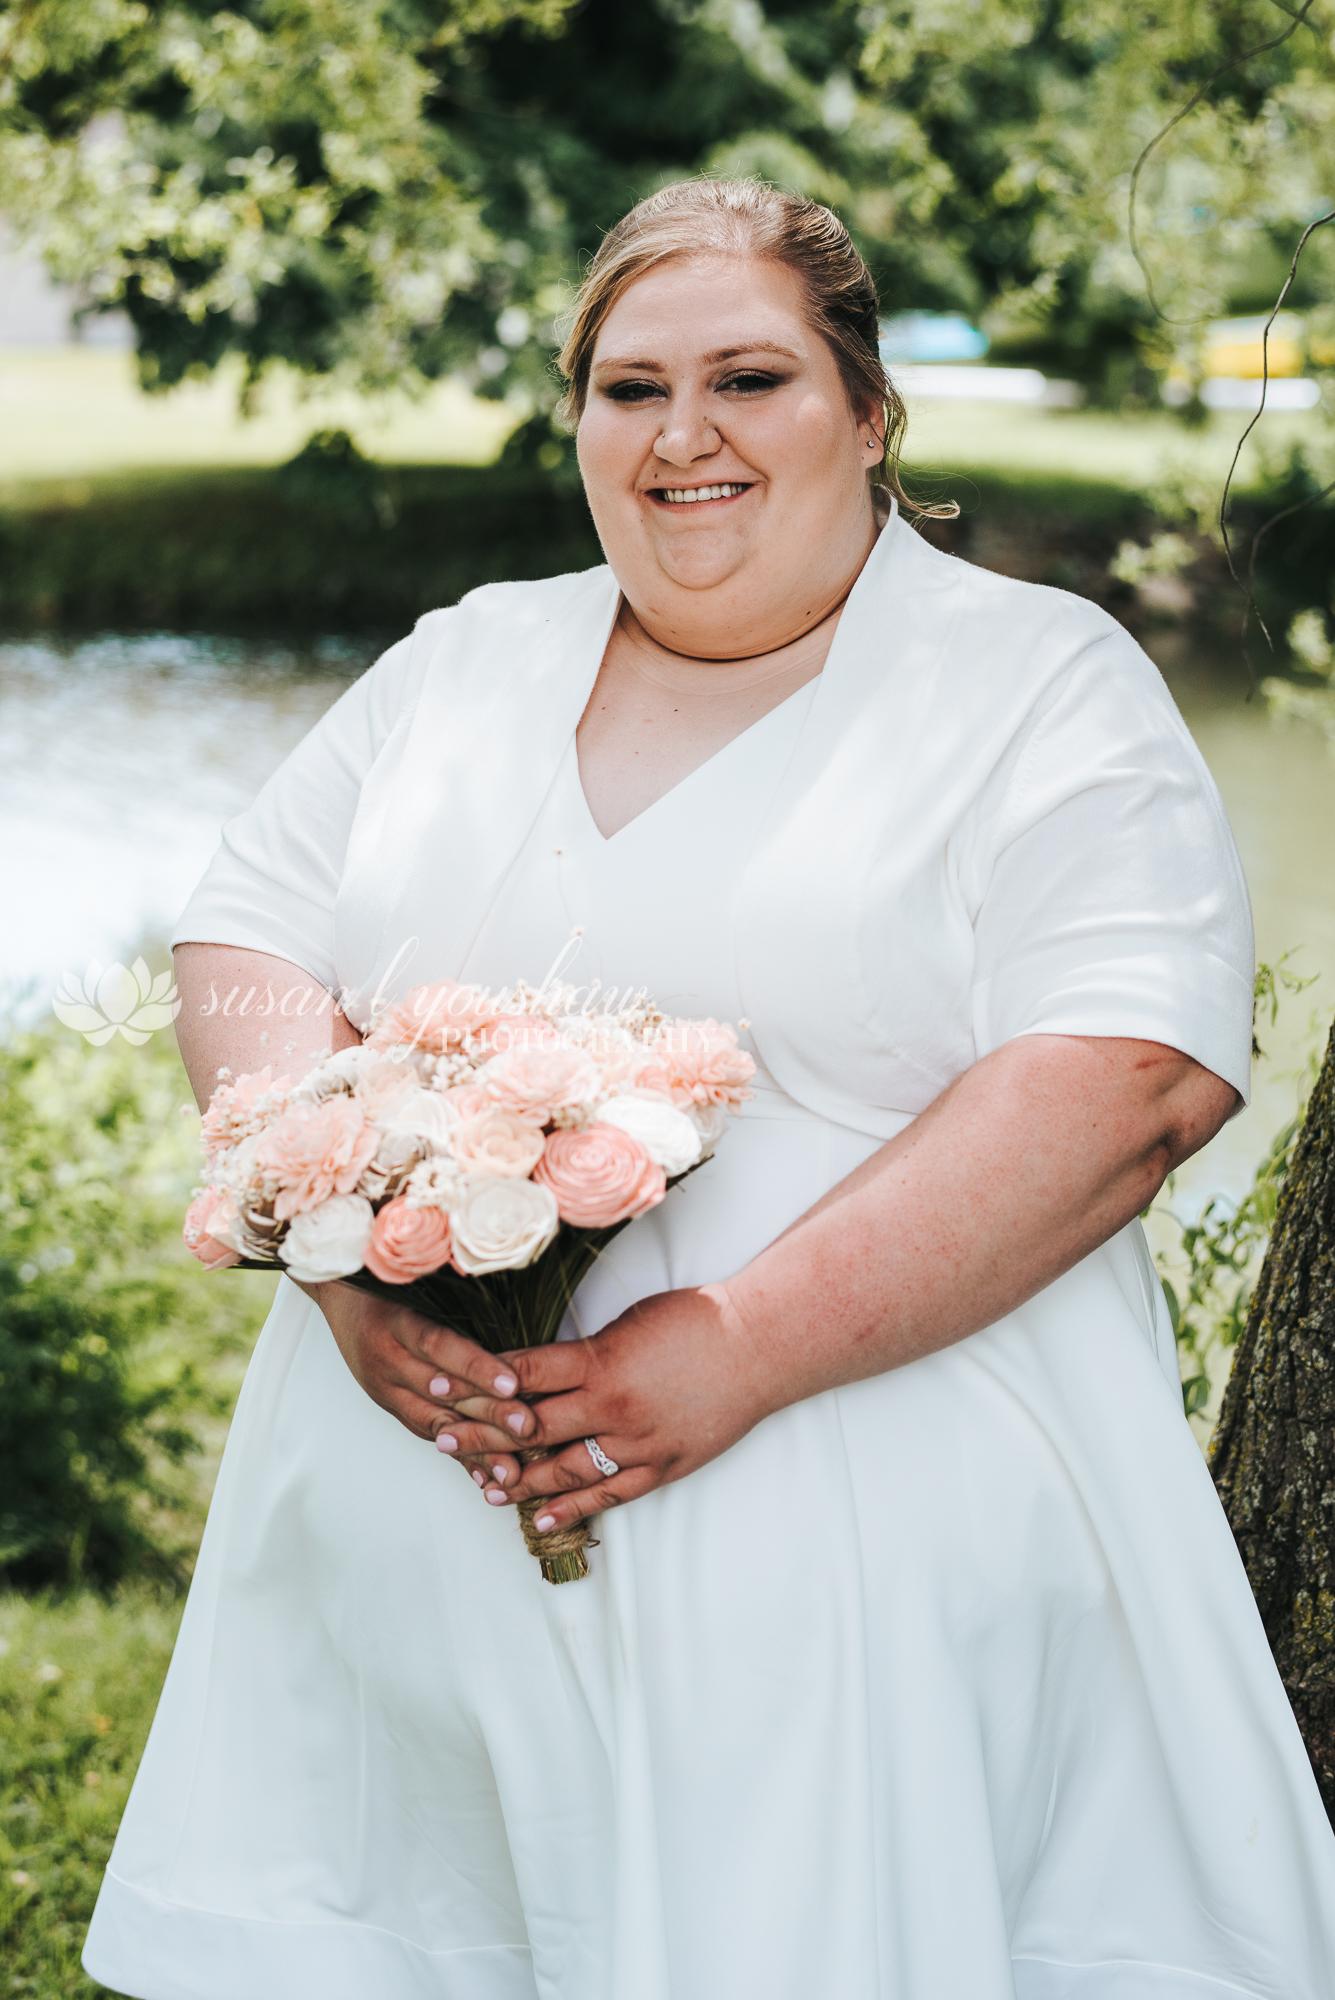 Bill and Sarah Wedding Photos 06-08-2019 SLY Photography -40.jpg